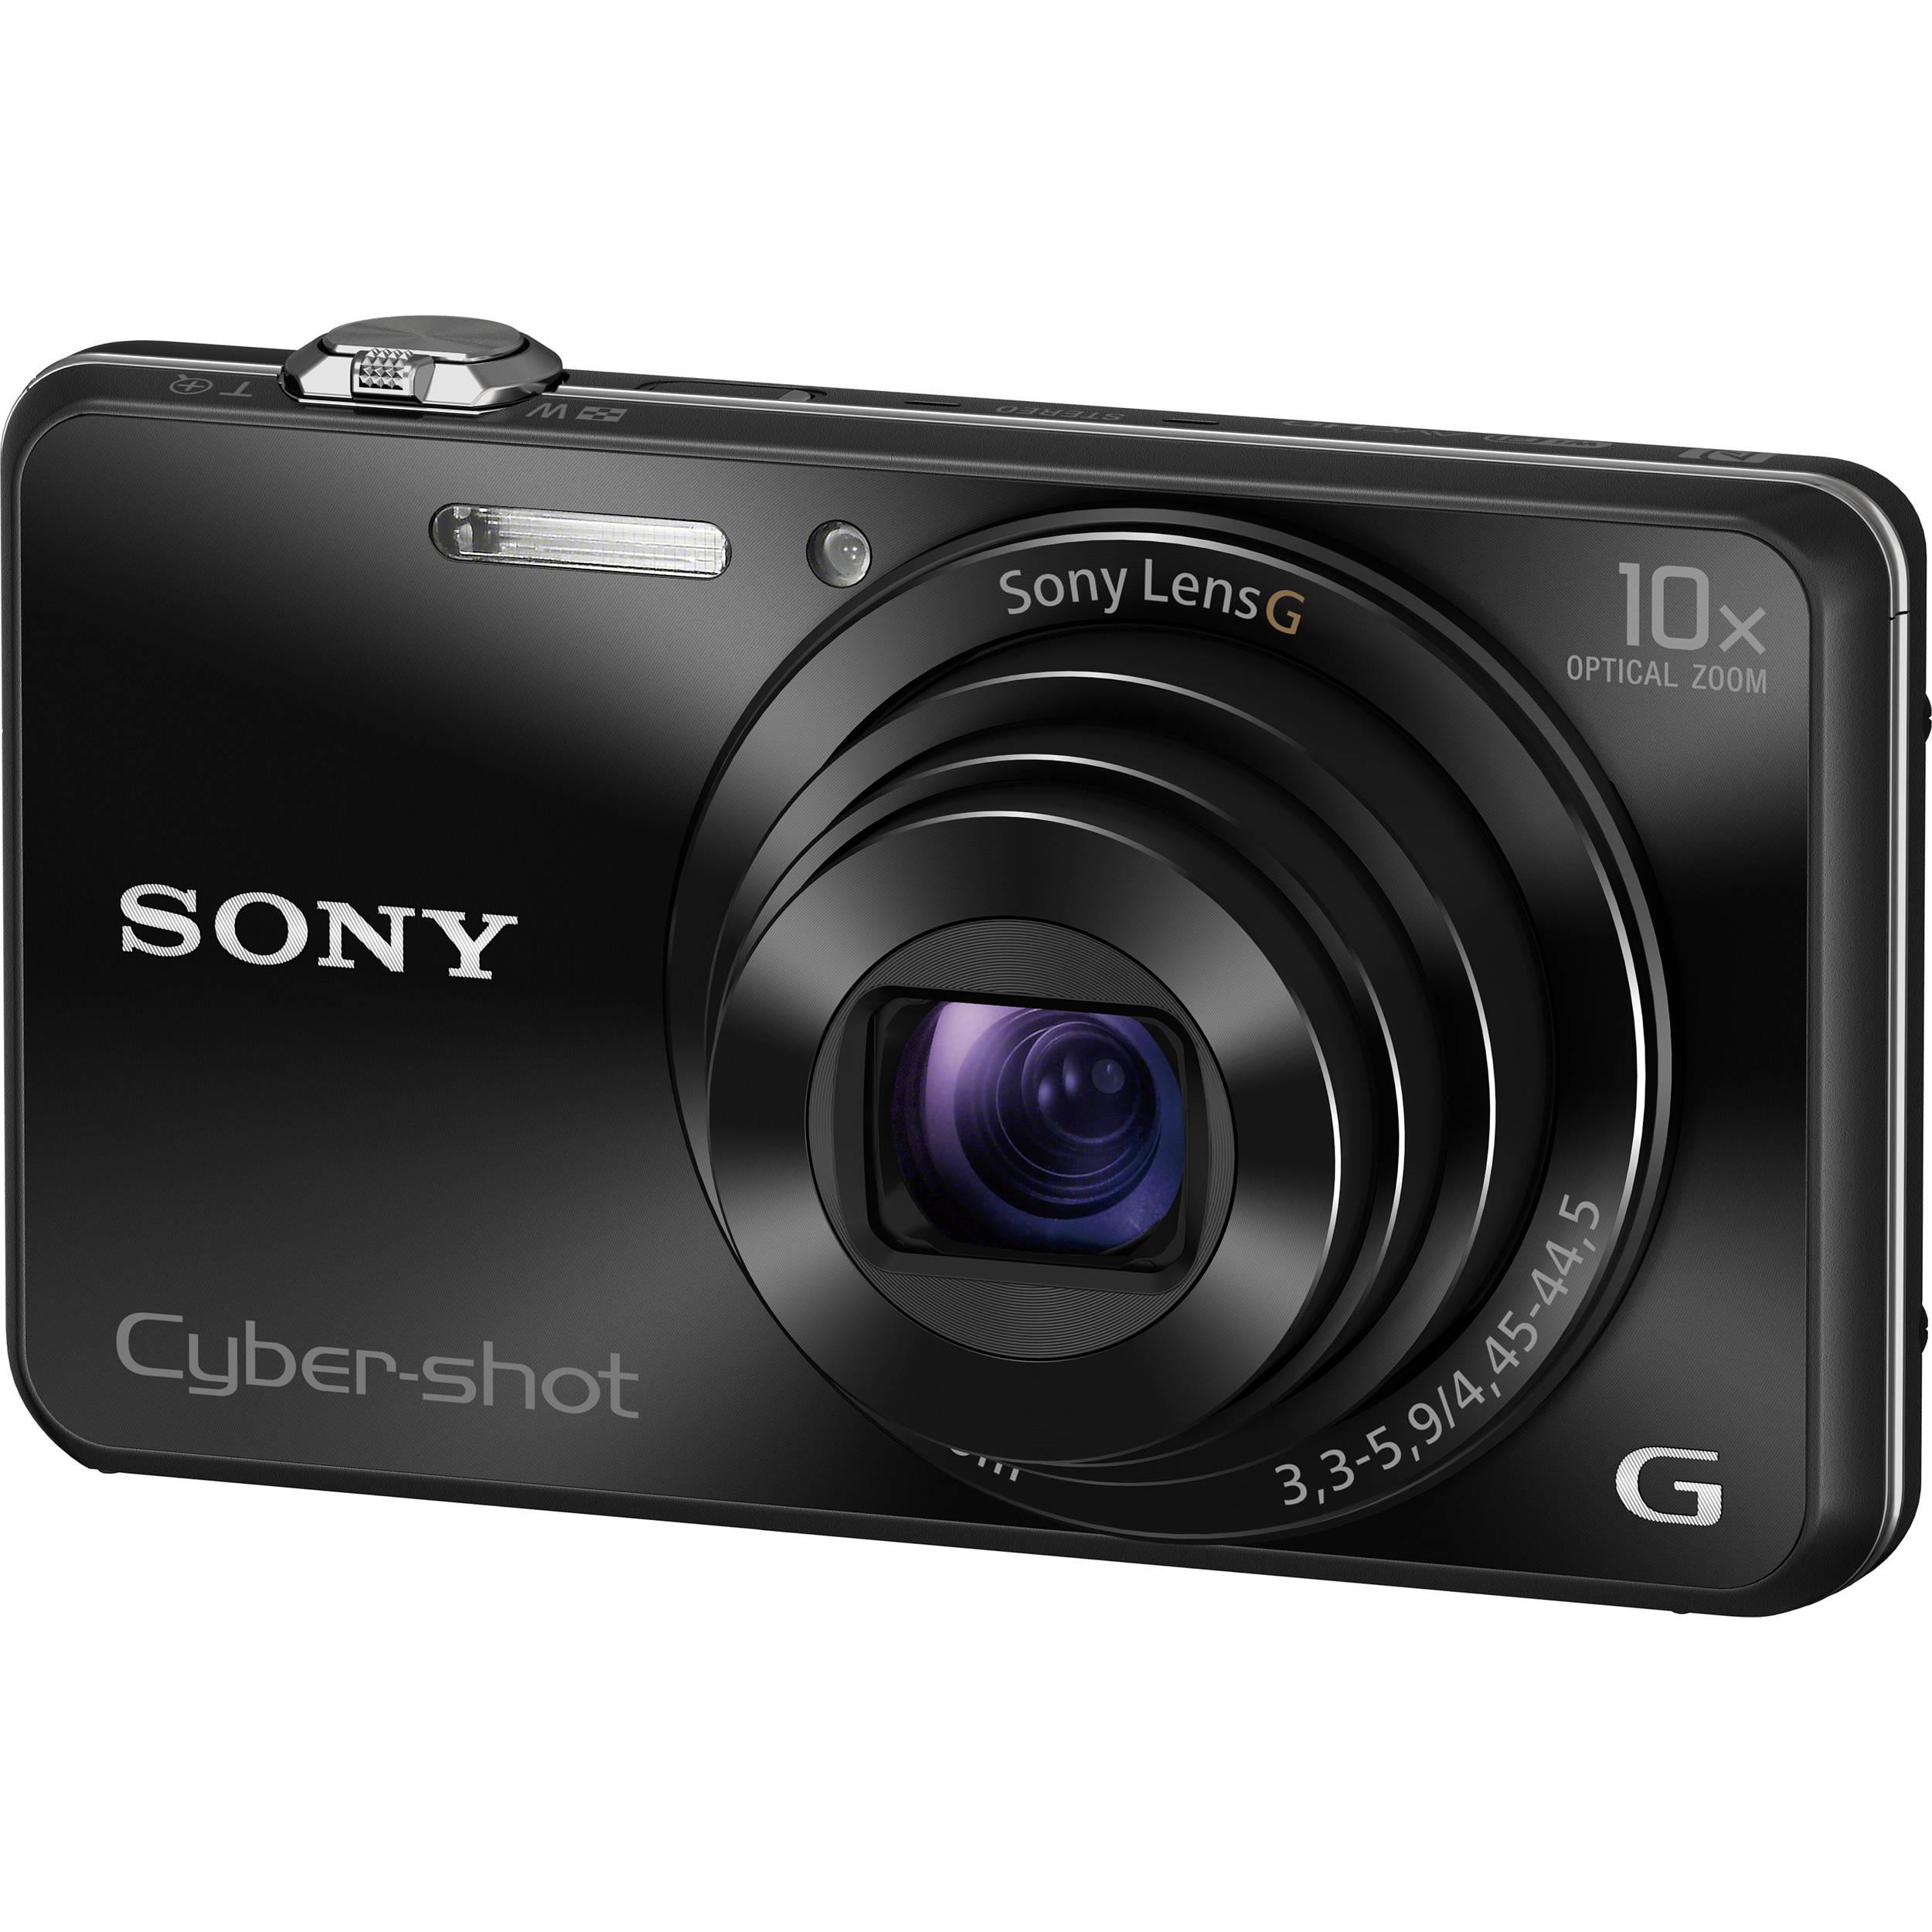 Harga Sony WX220 Compact Camera 10X Zoom Optik